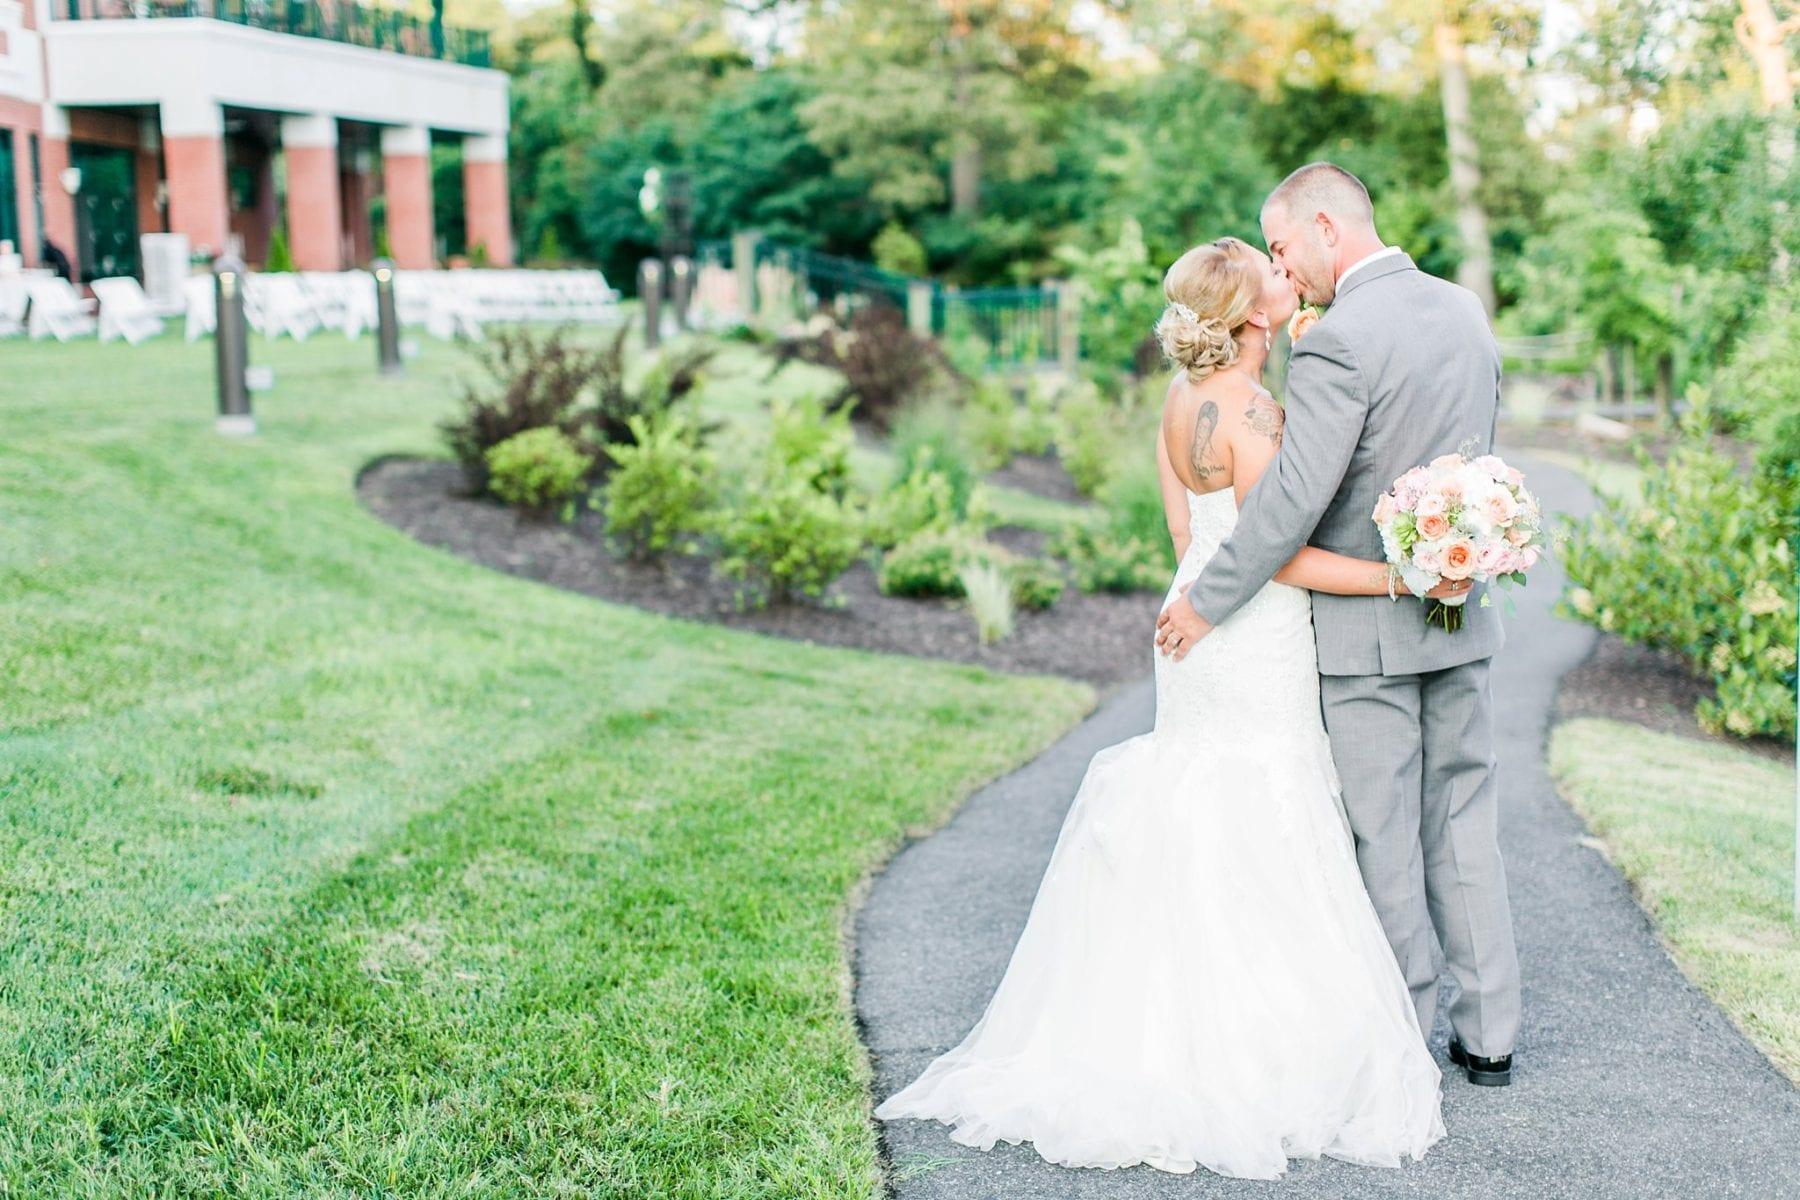 Waters Edge Wedding Photos Maryland Wedding Photographer Megan Kelsey Photography Katie & Conor-519.JPG